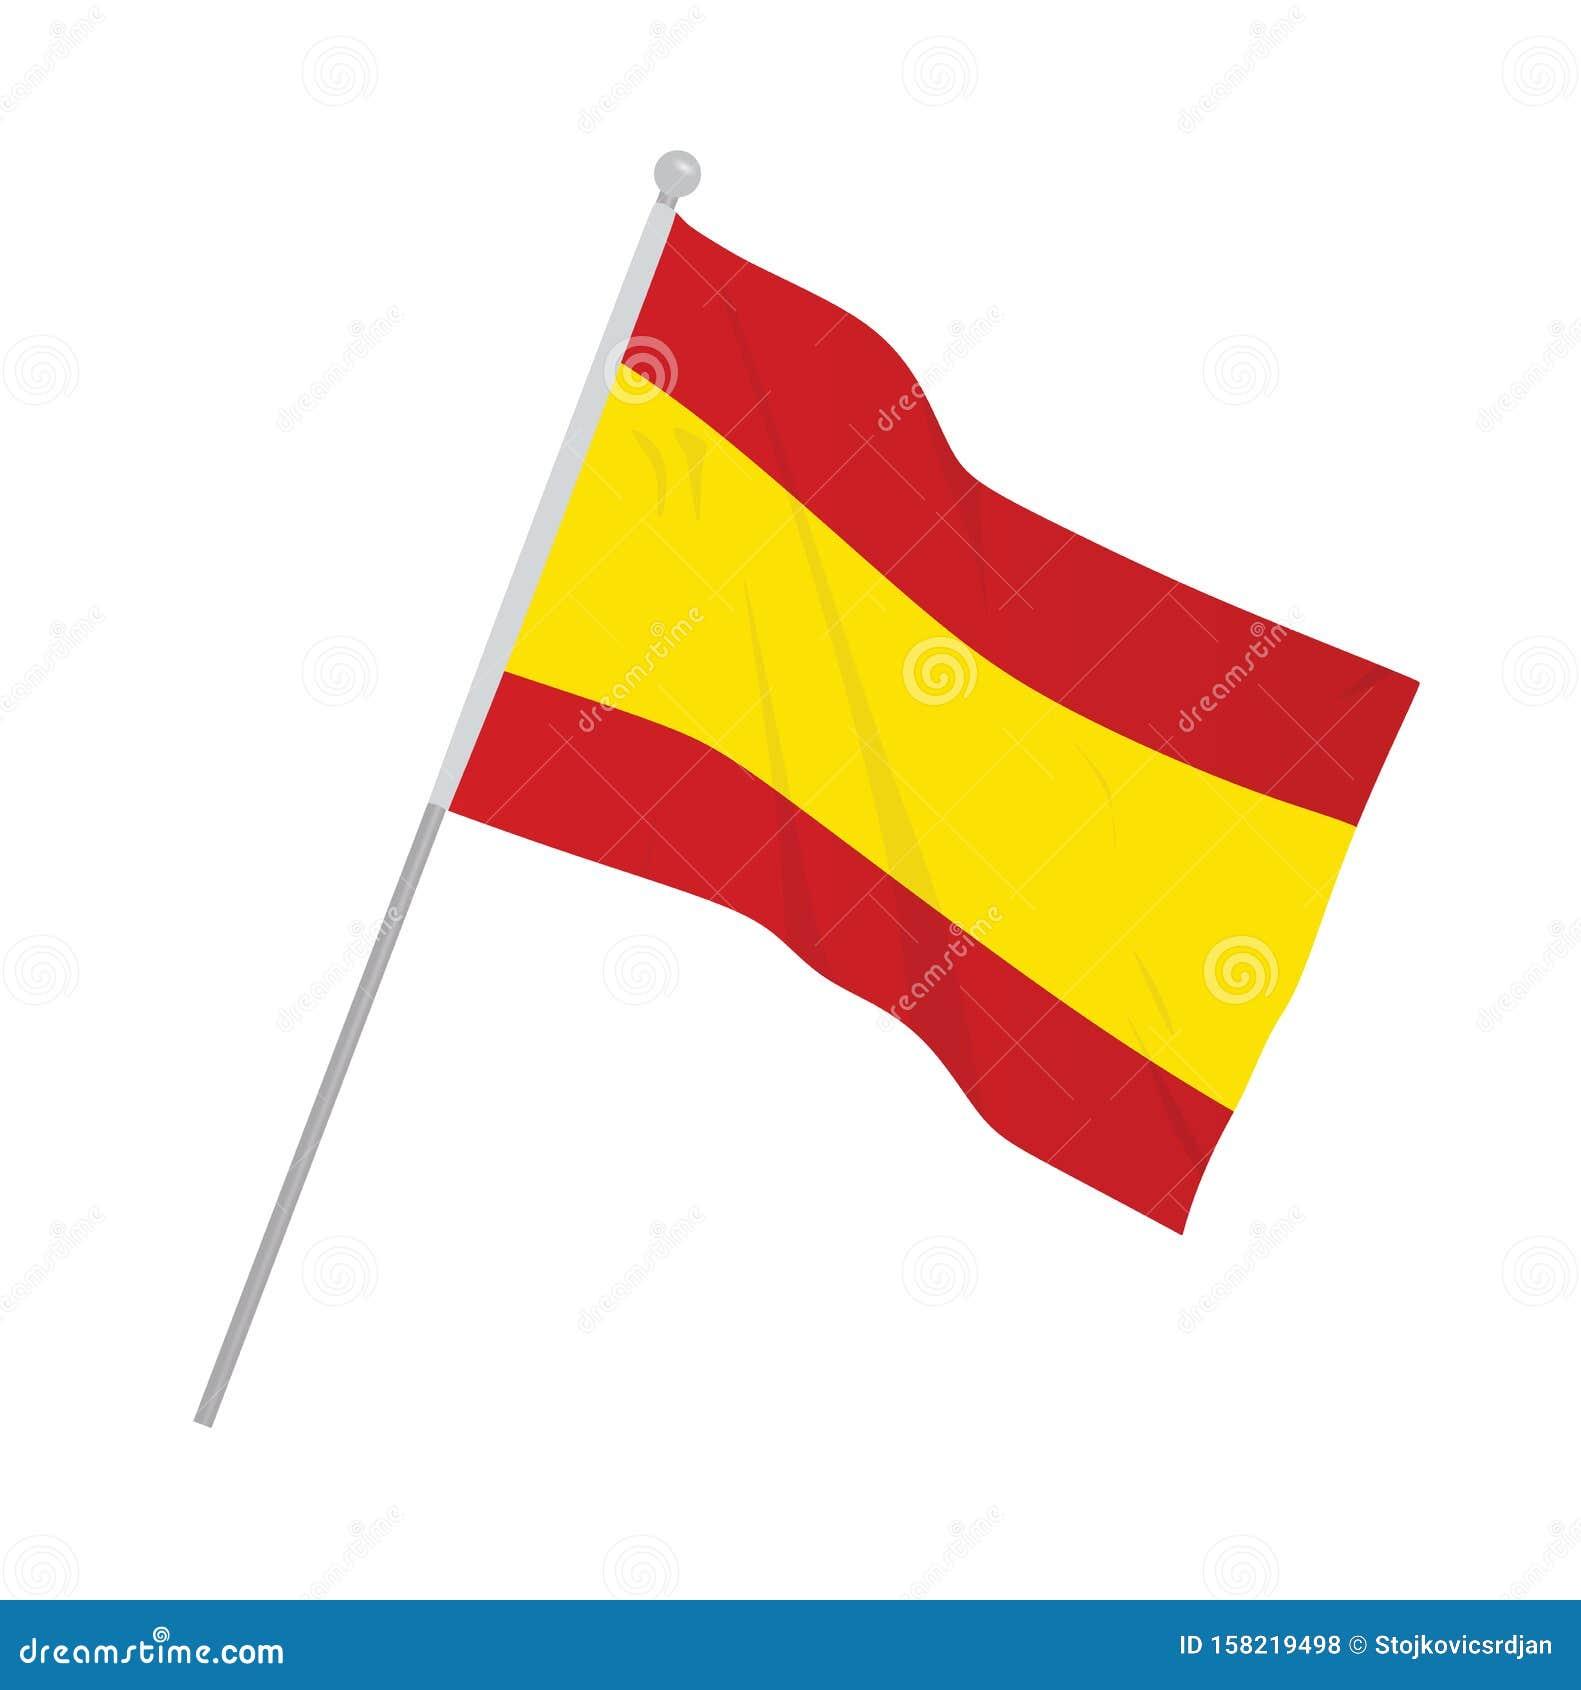 Spain national flag stock vector. Illustration of vector ...